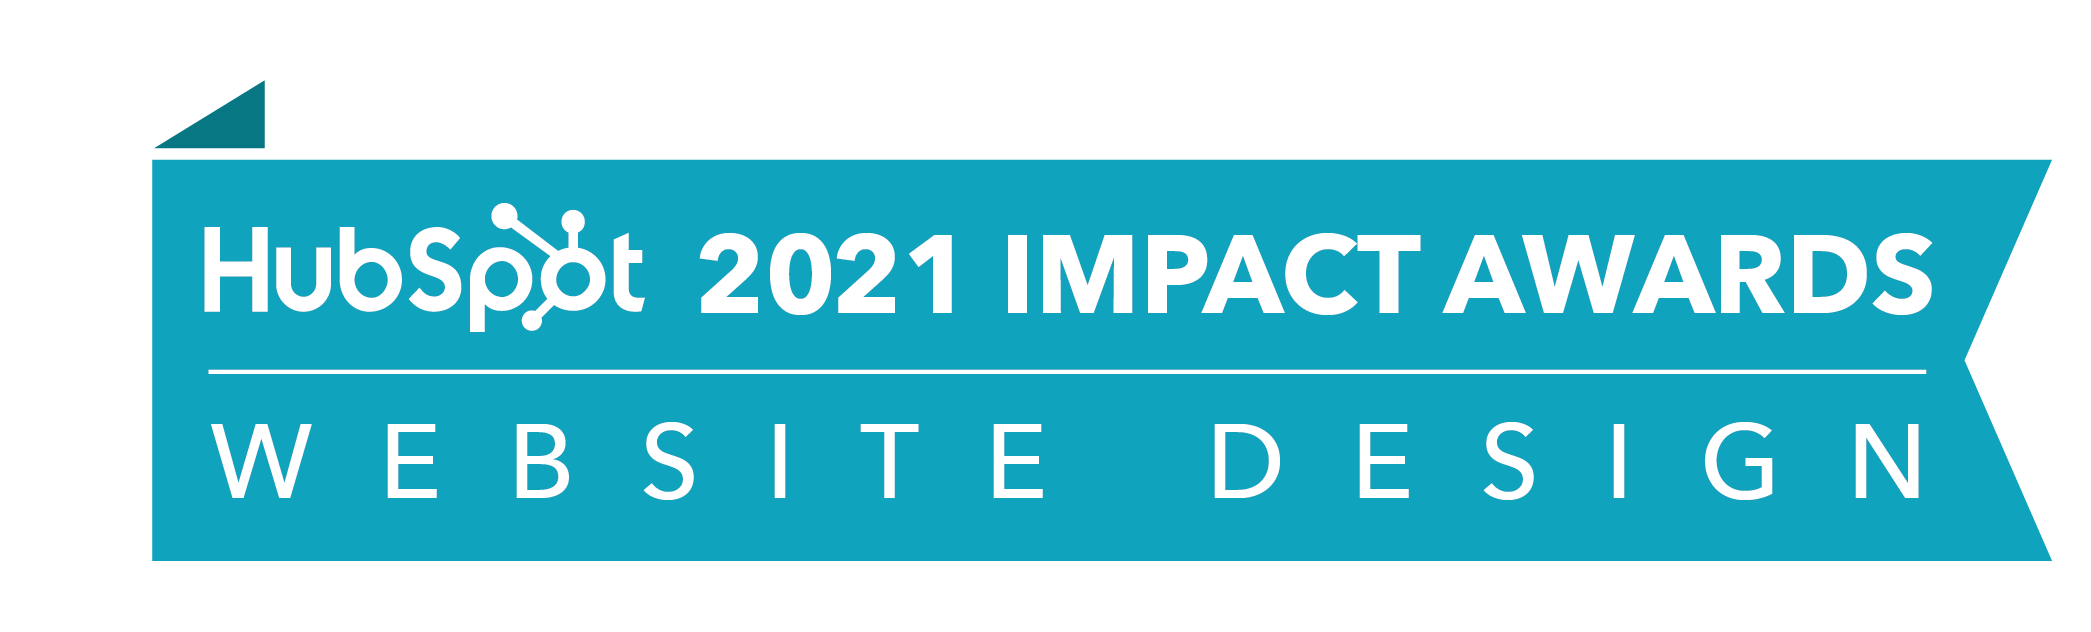 HubSpot_ImpactAwards_2021_WebsiteDesign2-2